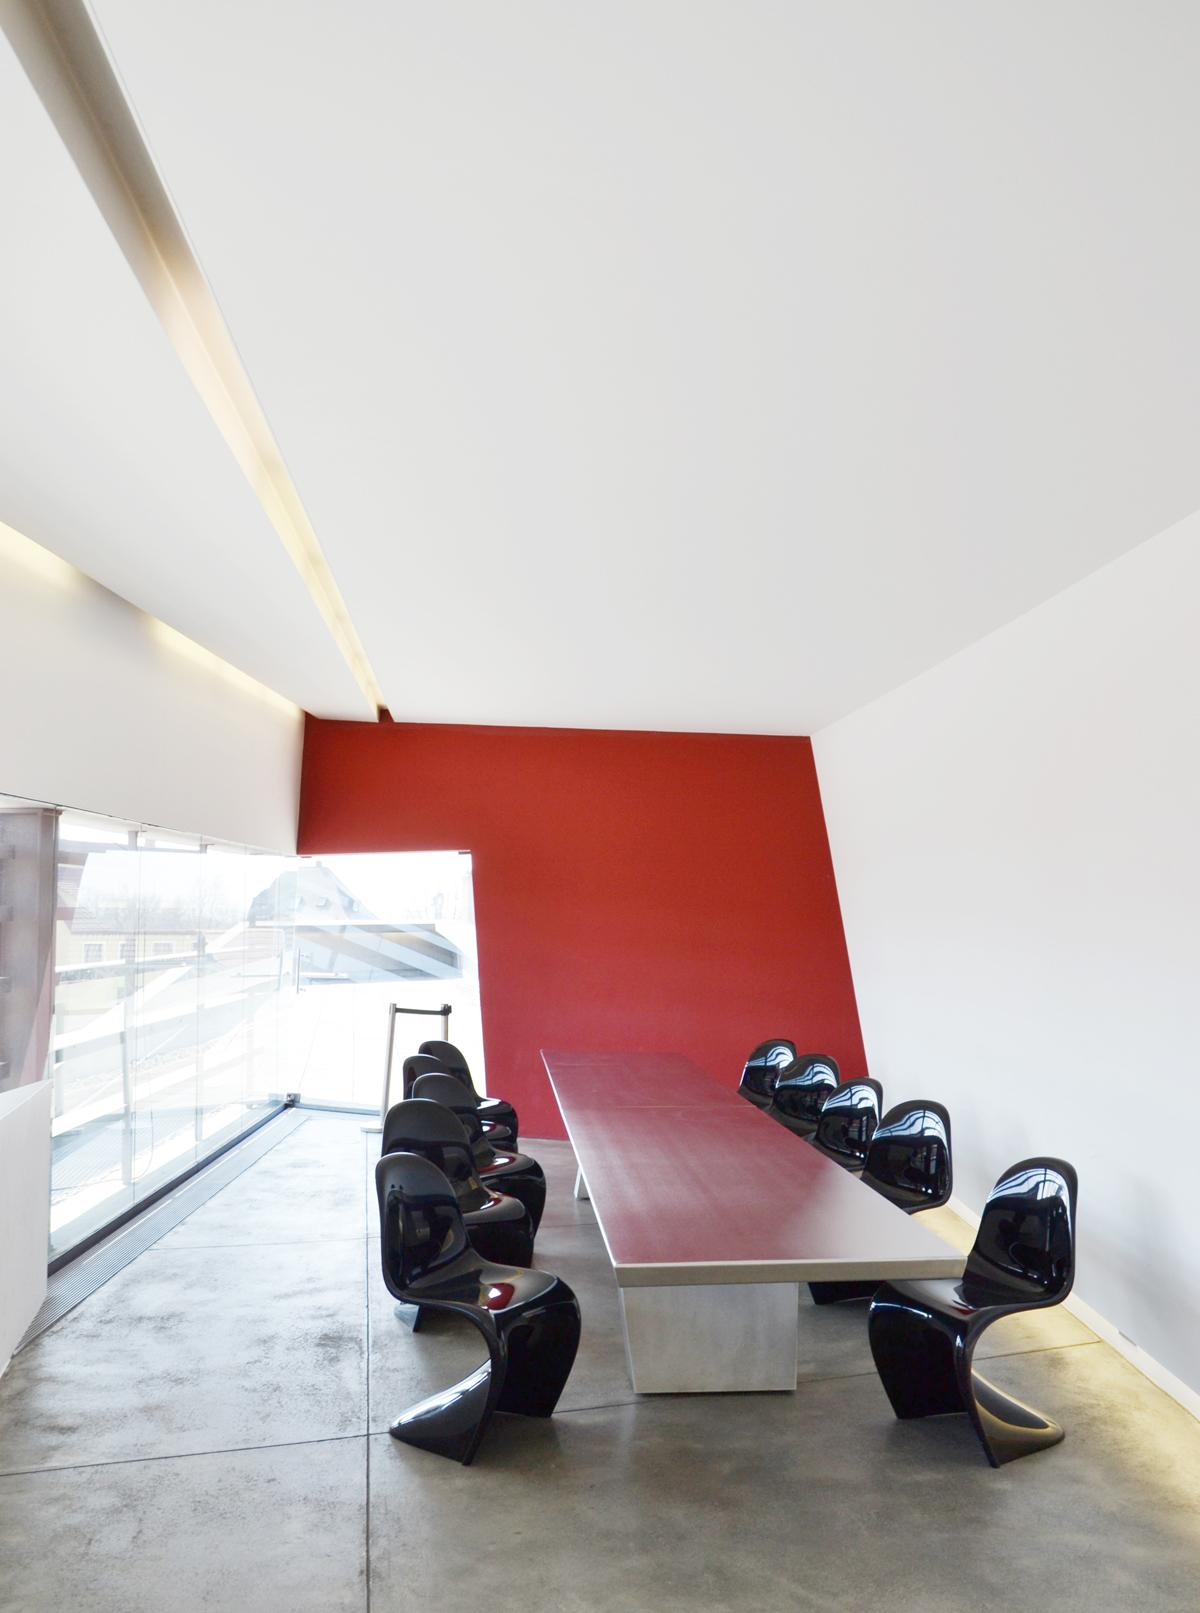 Zaha Hadid architecture Fire Station at Vitra Campus. Dining room